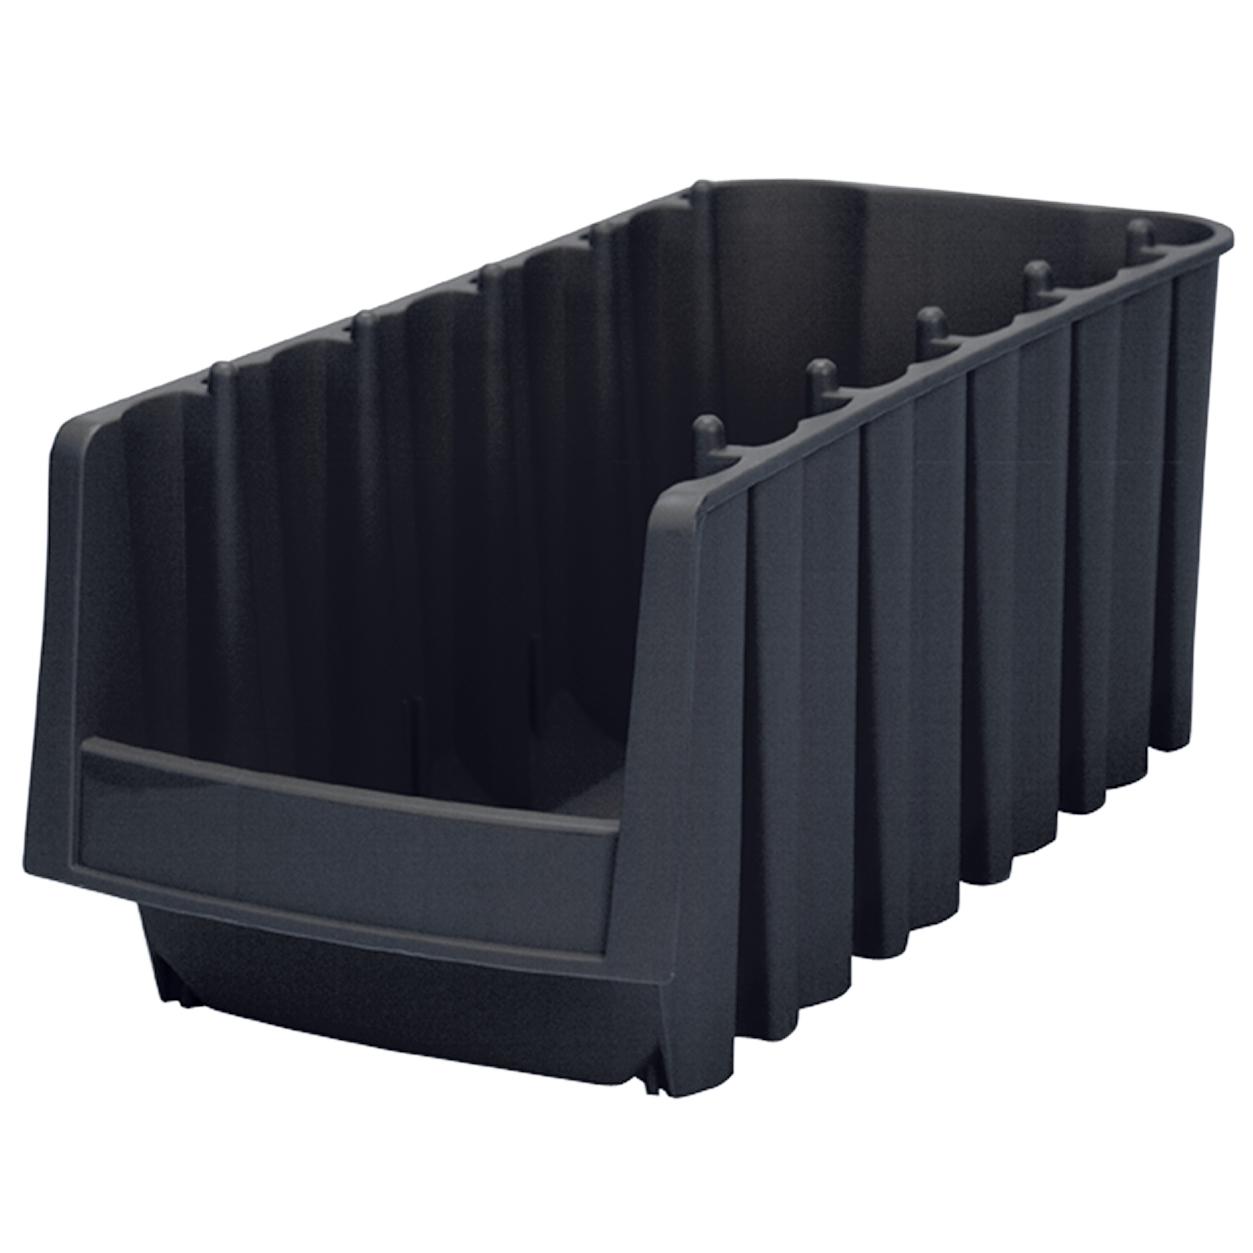 economy shelf bin